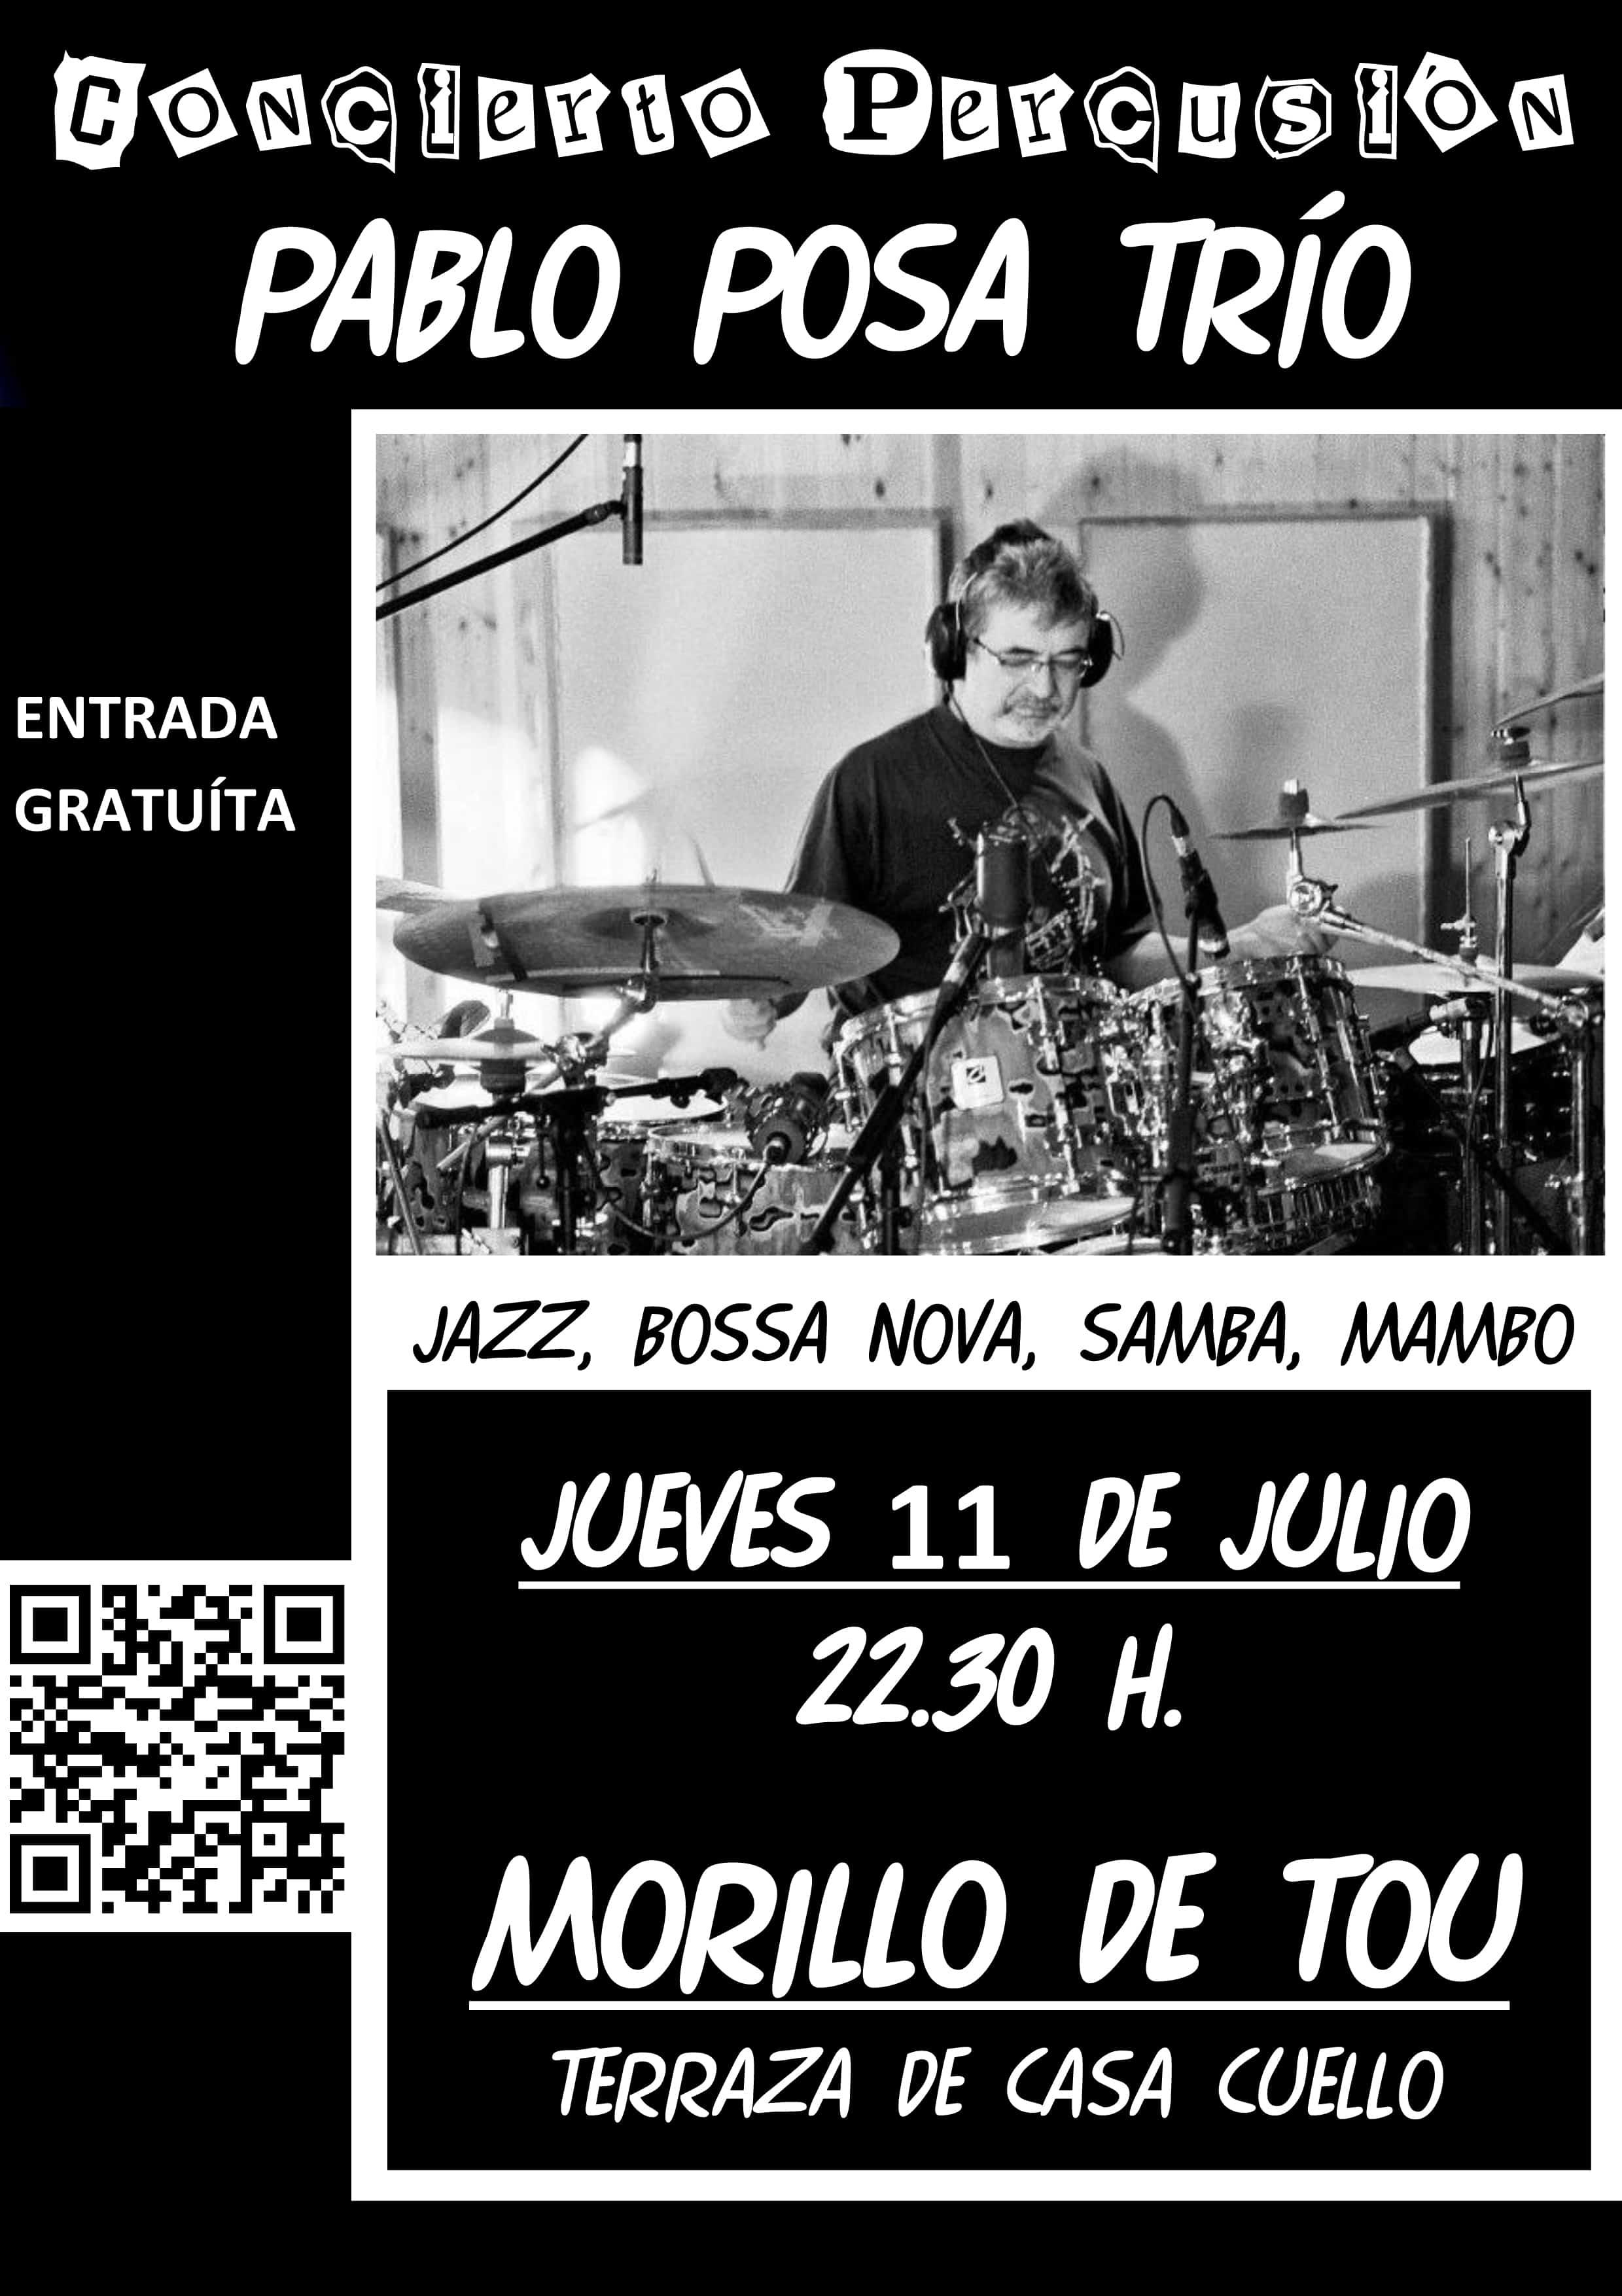 concierto_de_percusion_pablo_posa_trio_bidi_copiar.jpg